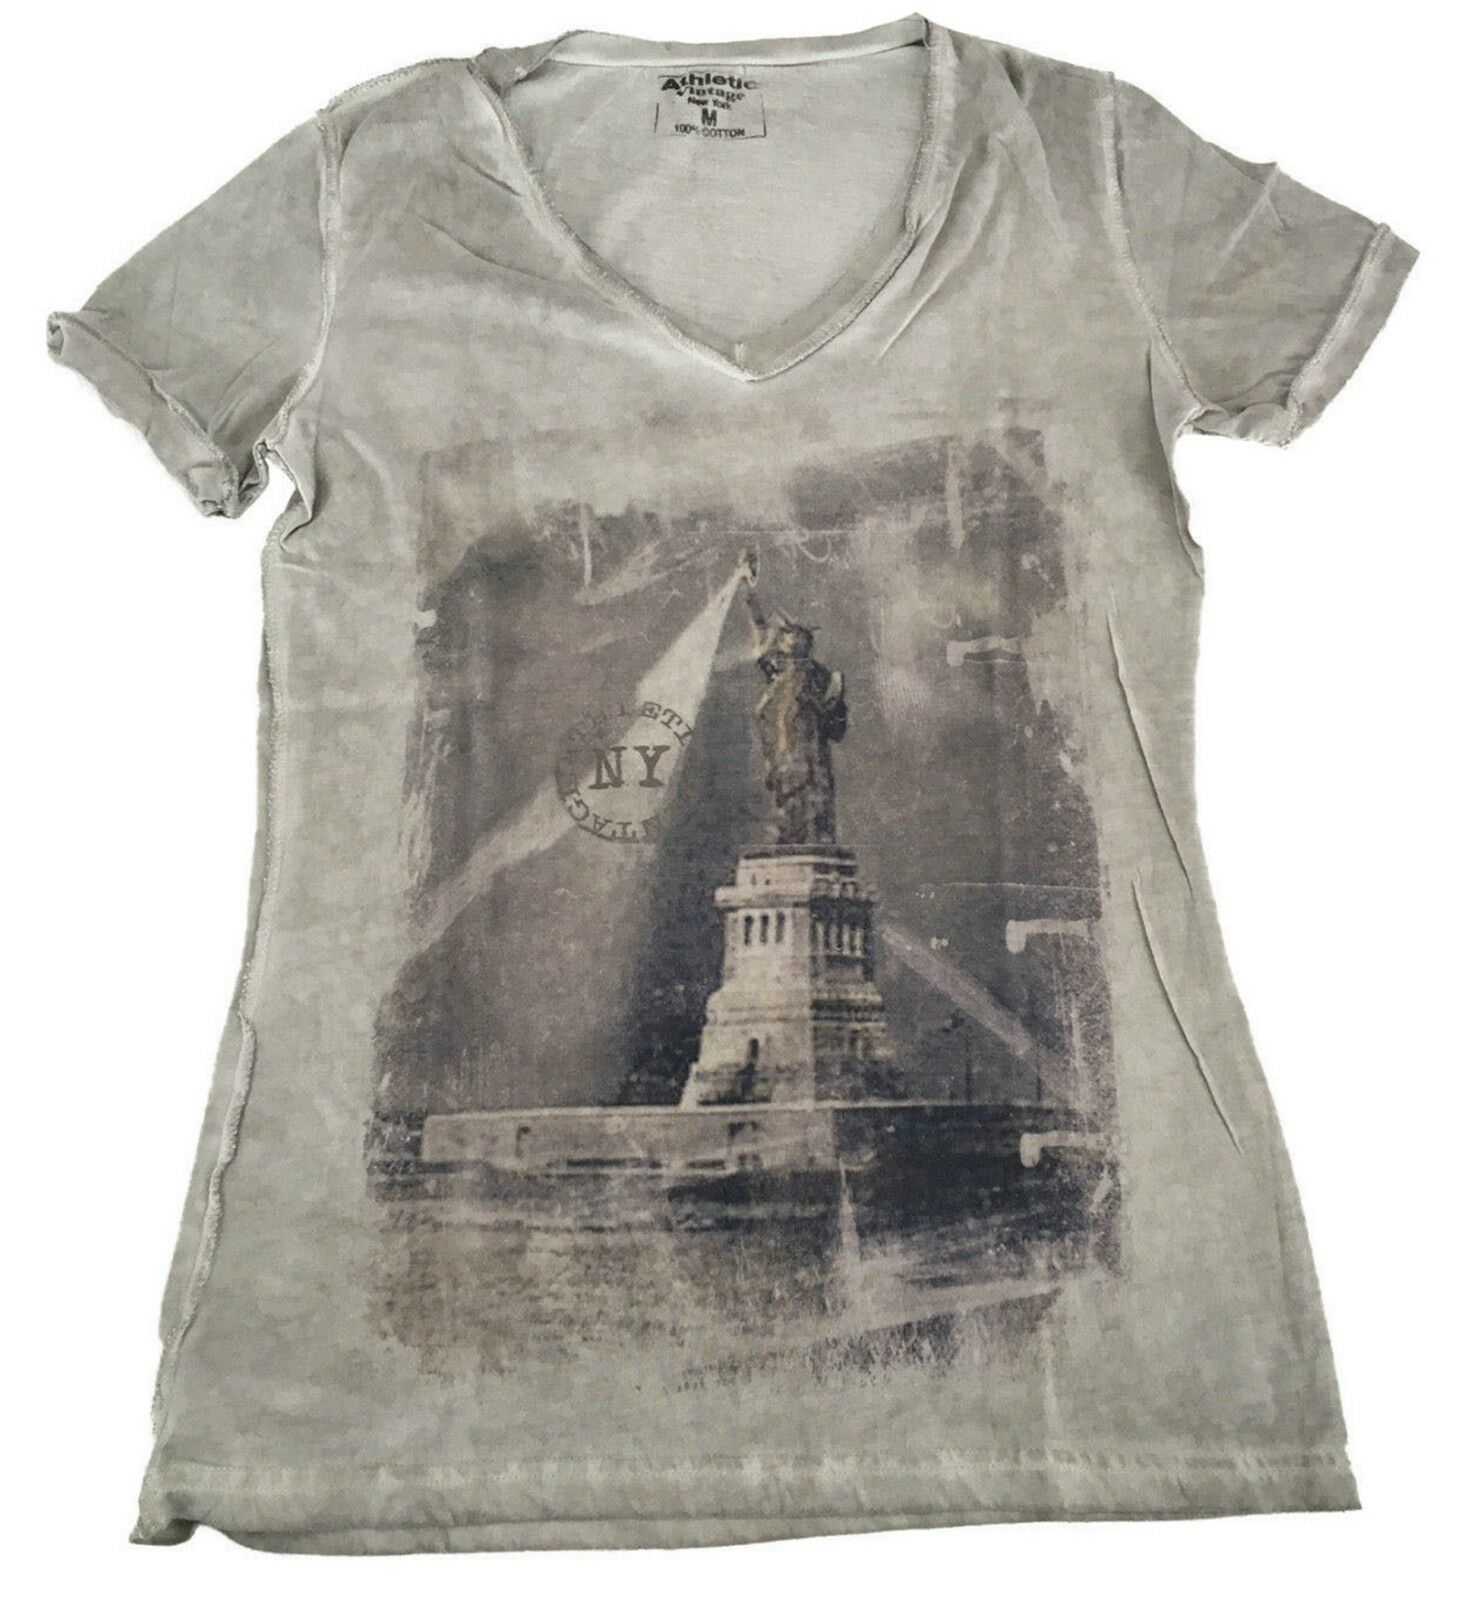 ATHLETIC VINTAGE NEW YORK T-Shirt Kurze Ärmel 100% Baumwolle MADE IN ITALY